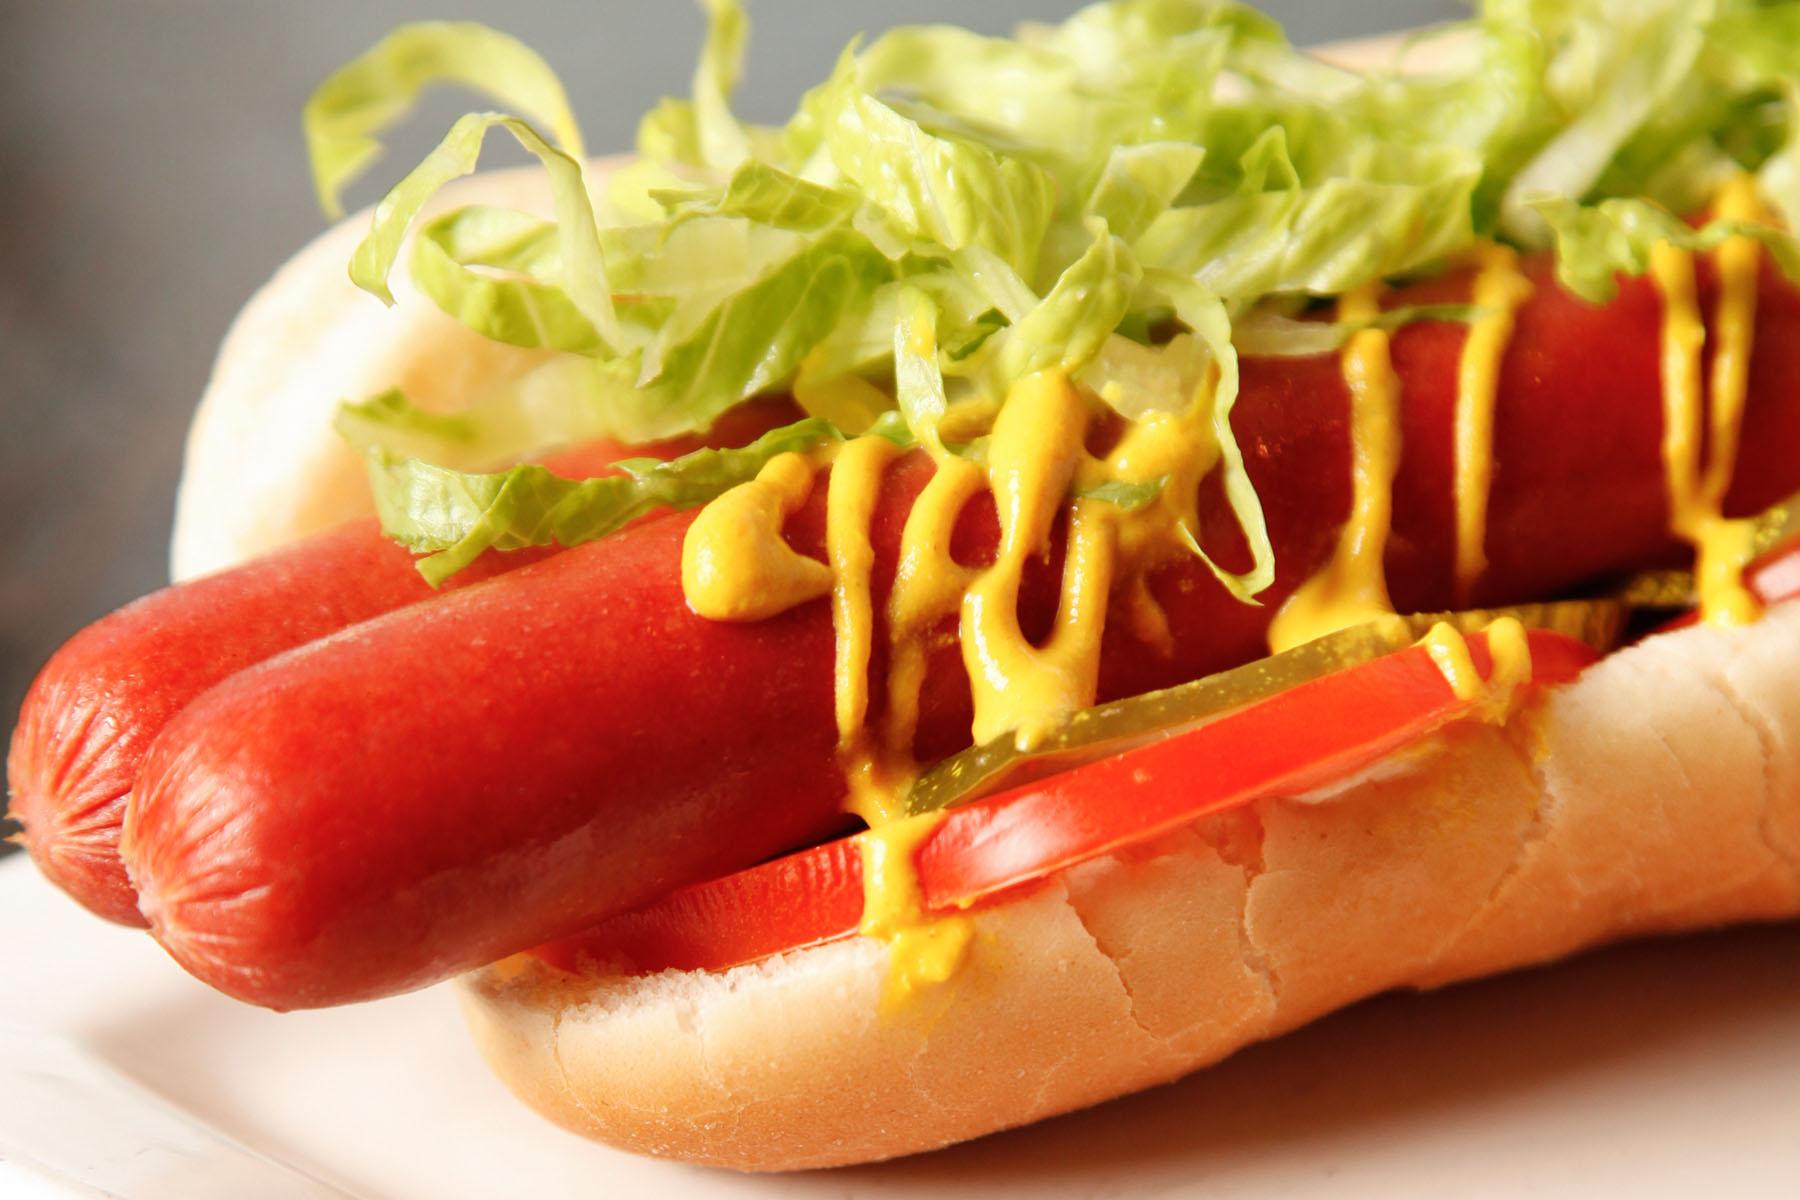 Chicago Hot Dog Friday